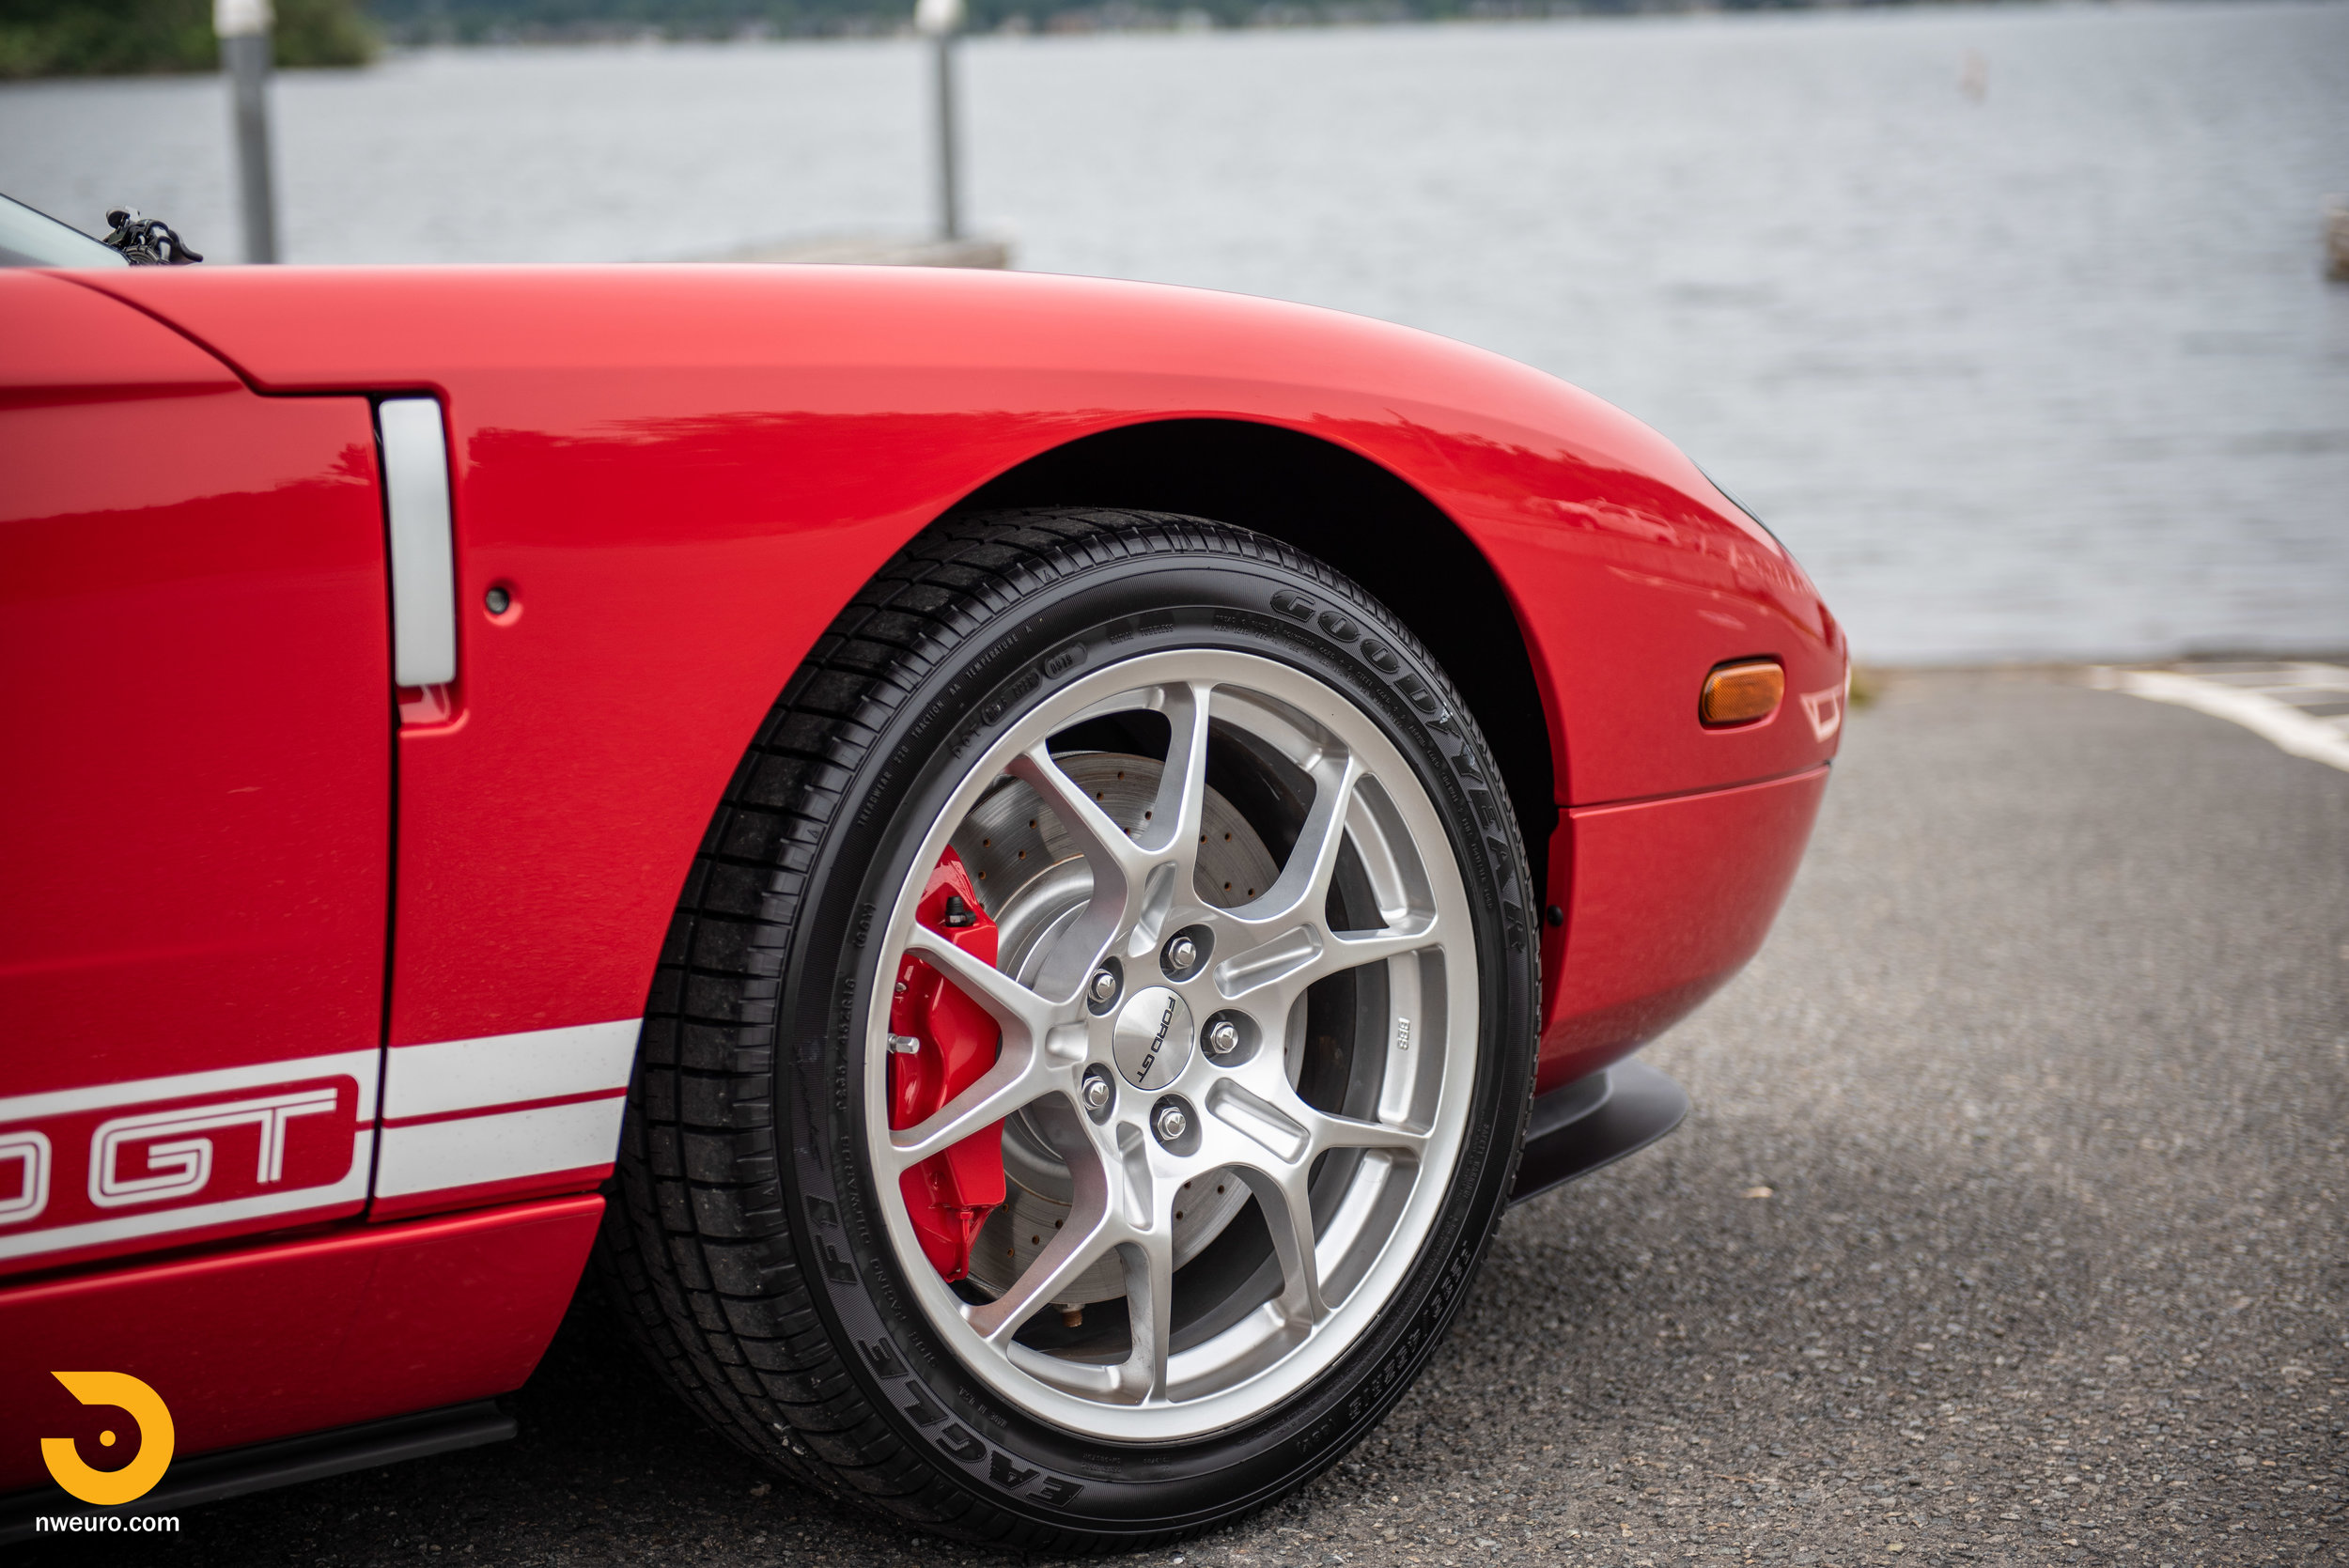 2005 Ford GT Red-69.jpg